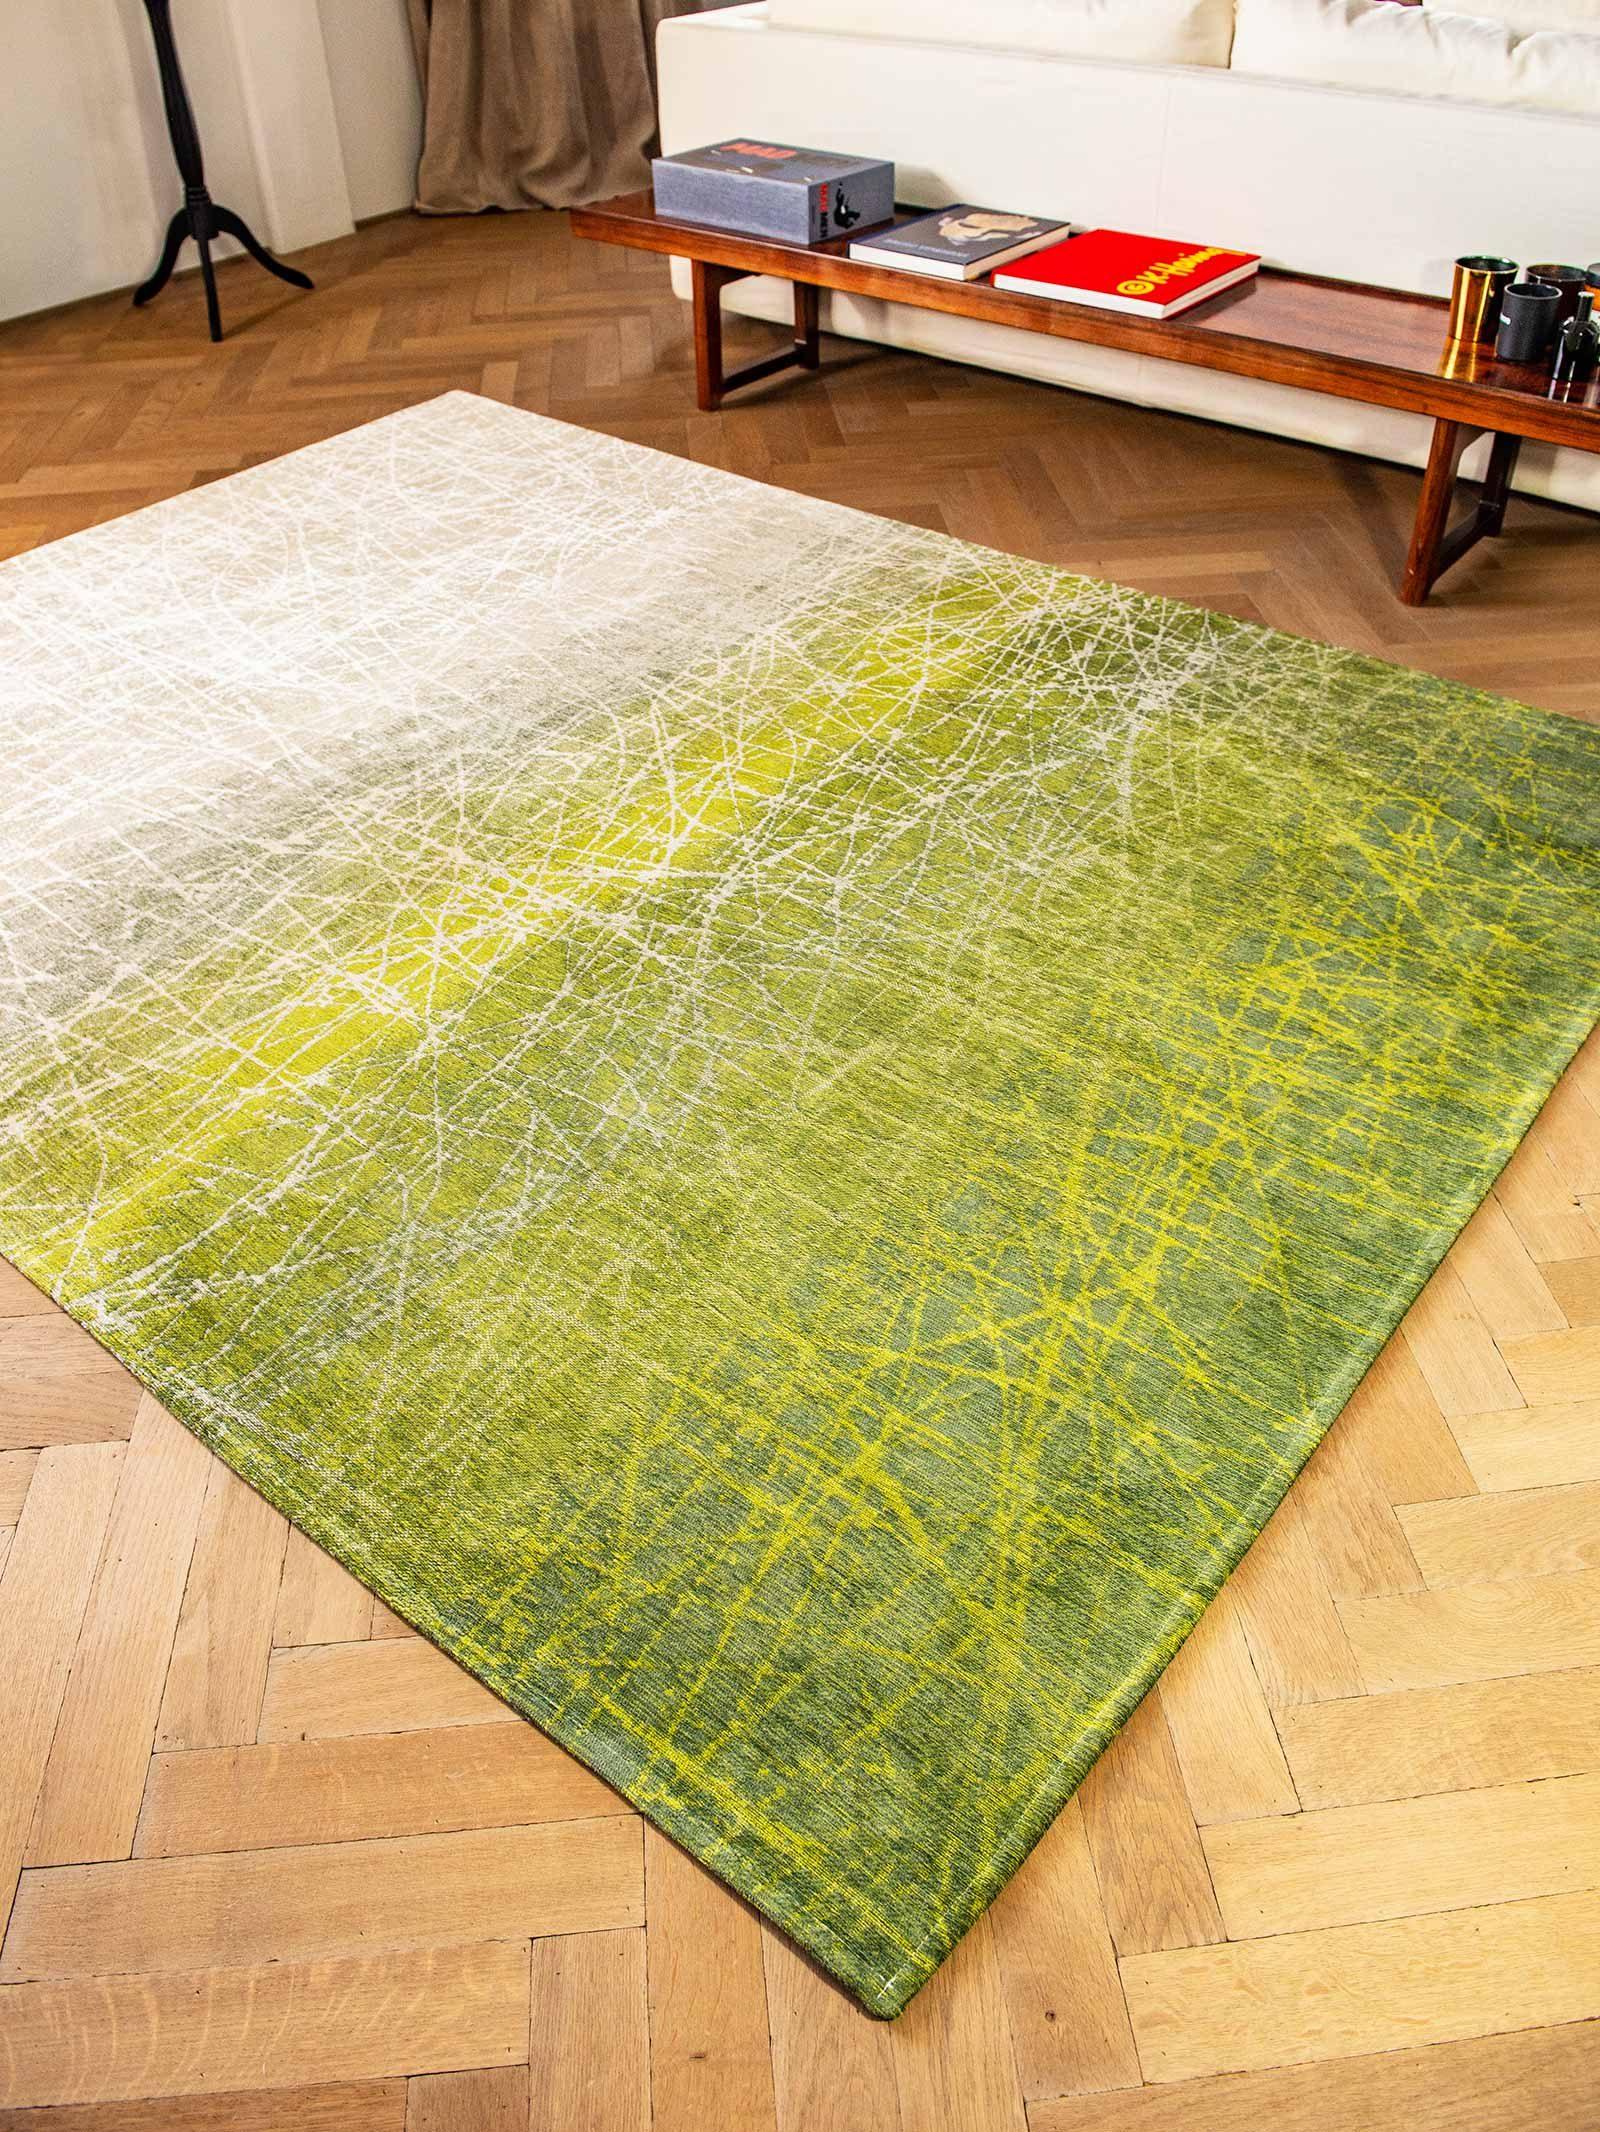 alfombras Louis De Poortere LX 8882 Mad Men Fahrenheit Central Park Green interior 3